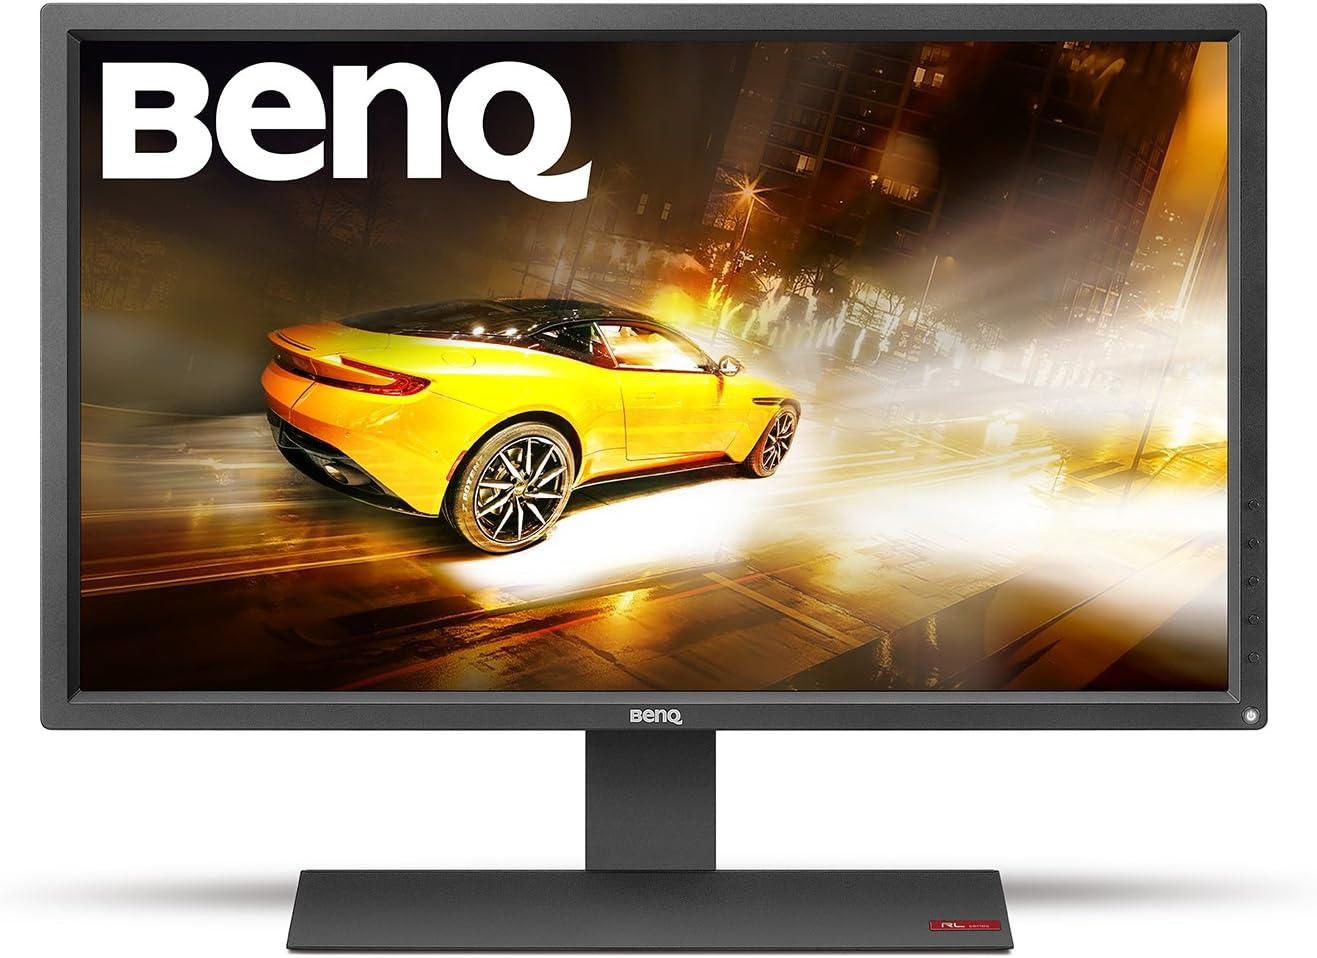 BenQ RL2755HM - Monitor Gaming LED de 27